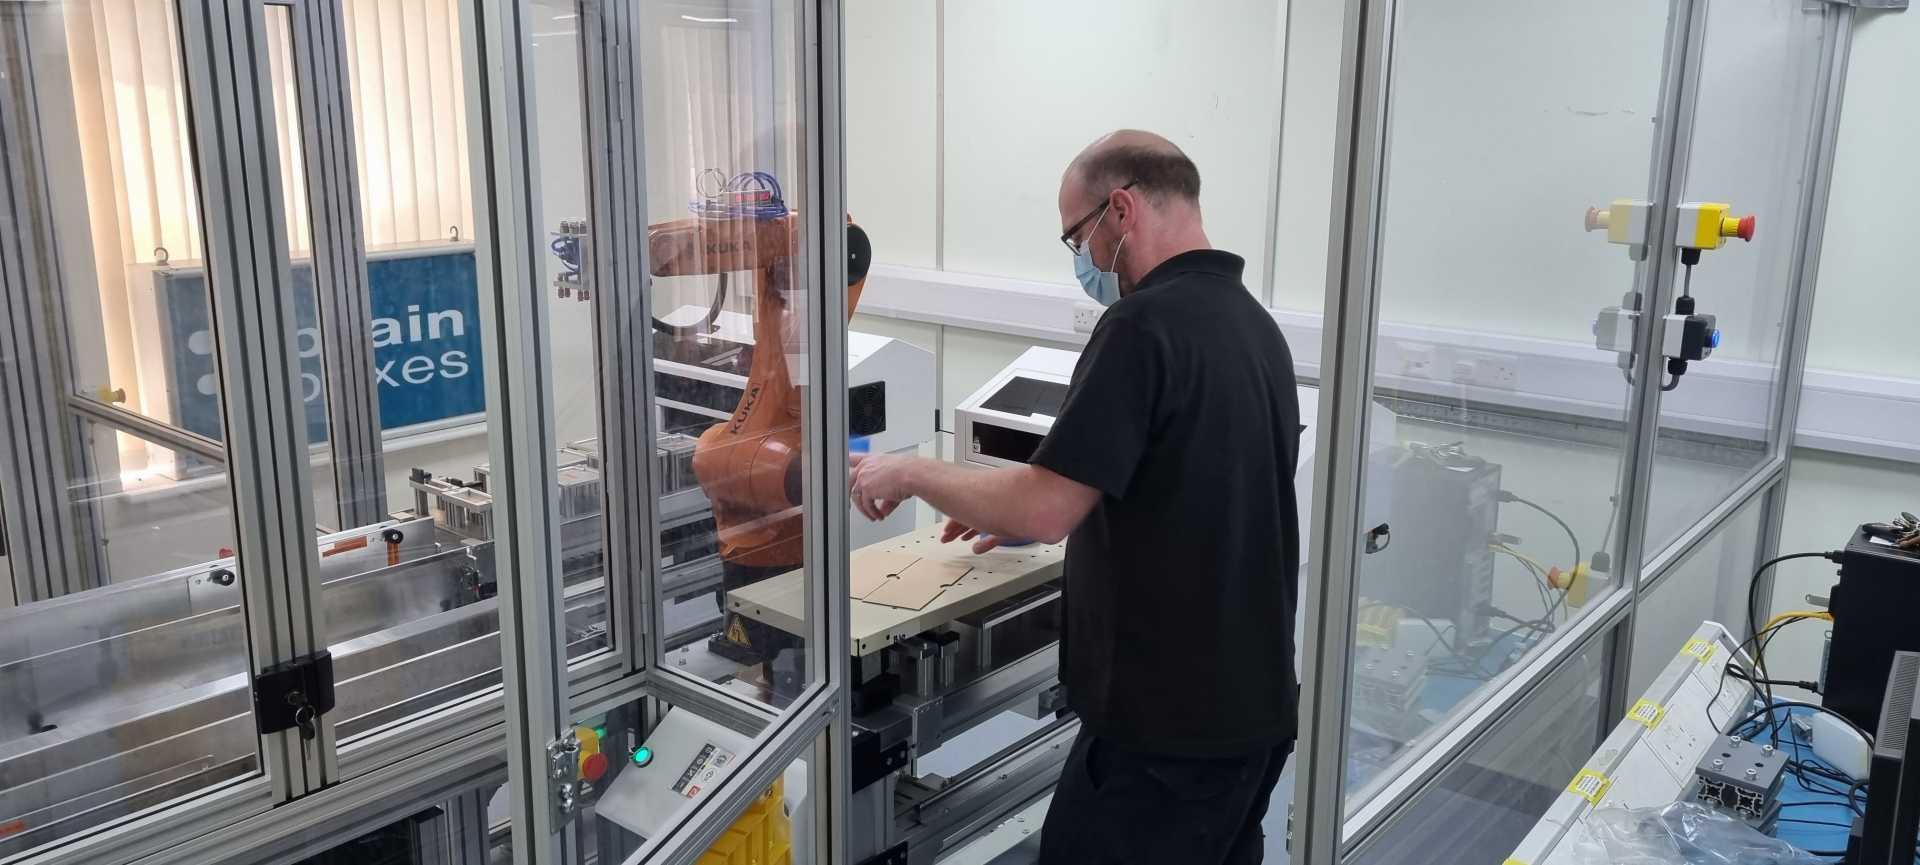 A Brainboxes operator using robotics Courtesy of Brainboxes.